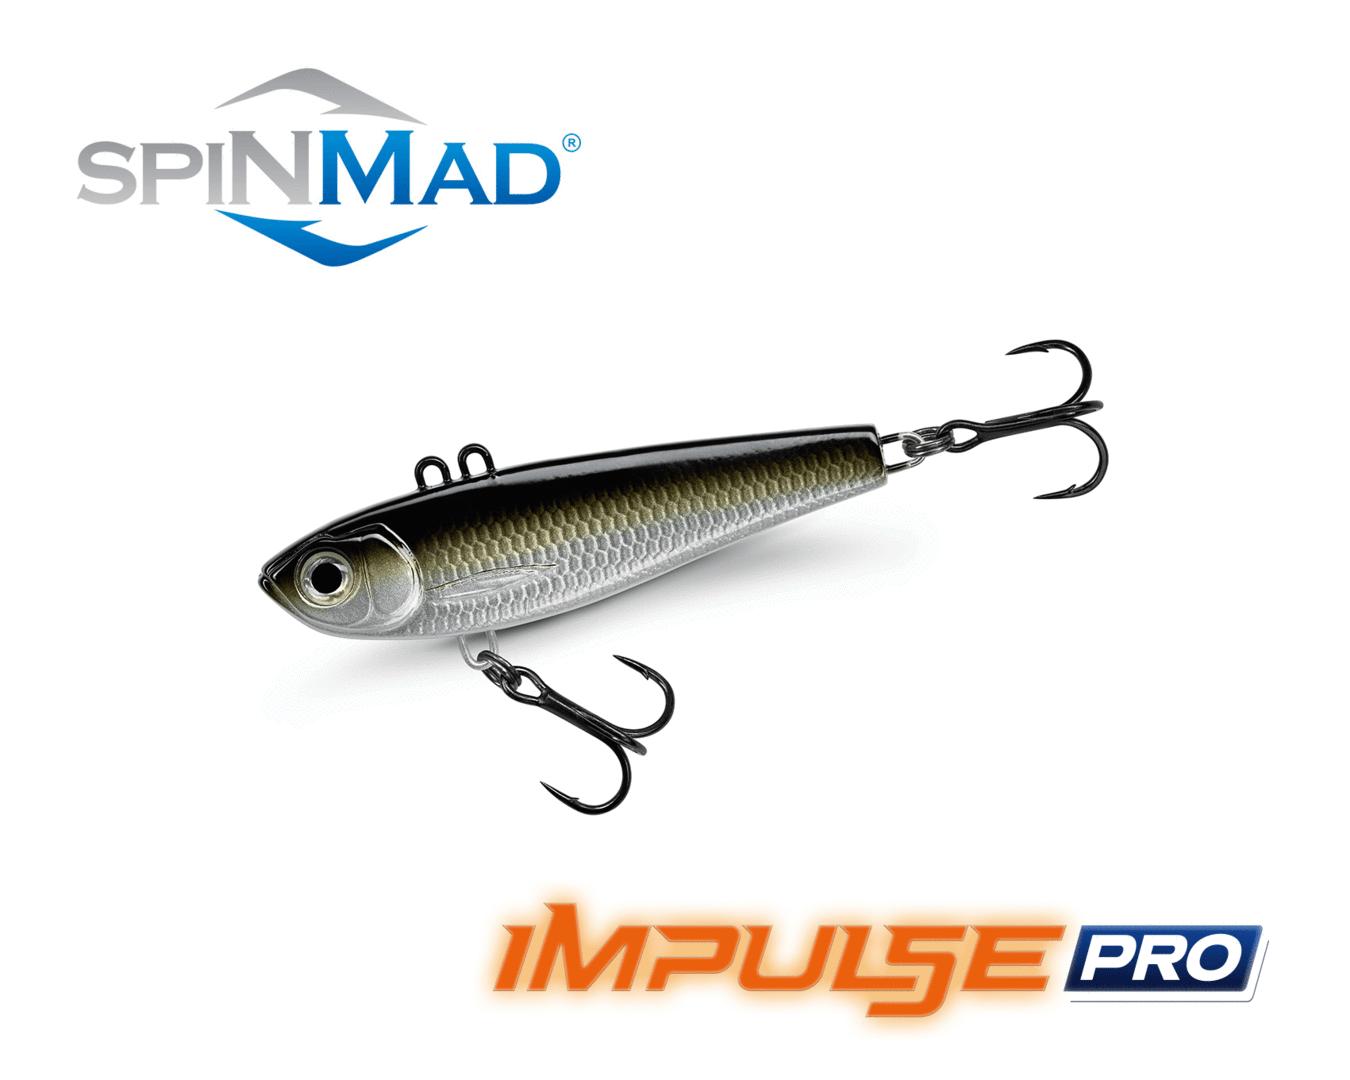 Spinmad Impulse Pro 2801